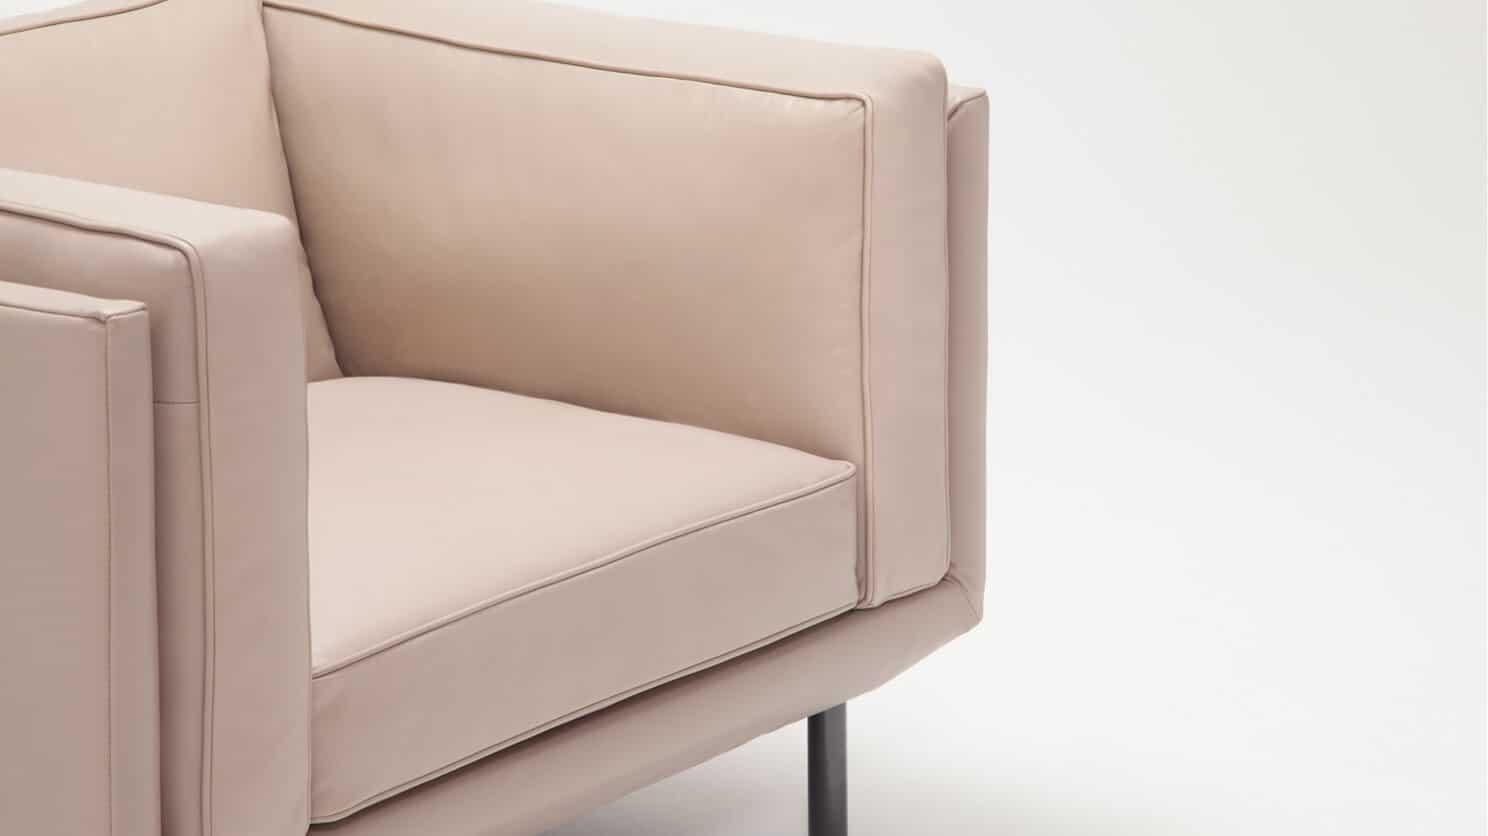 37154 02 3 chairs plateau chair feather coachella warm grey detail 01